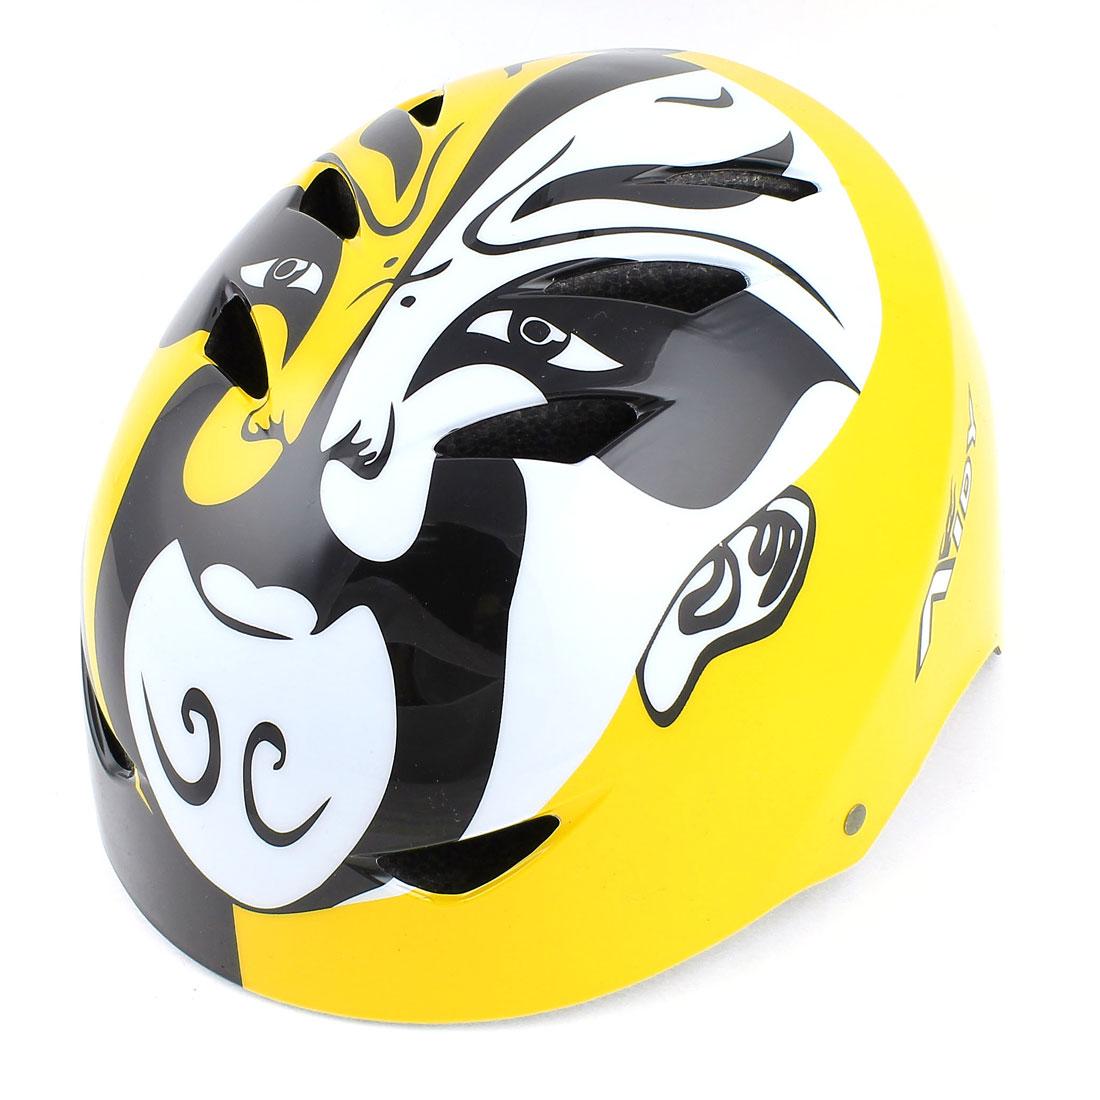 Peking Opera Mask Print Bike Bicycle Cycling Protective Snowboard Skating Helmet Yellow